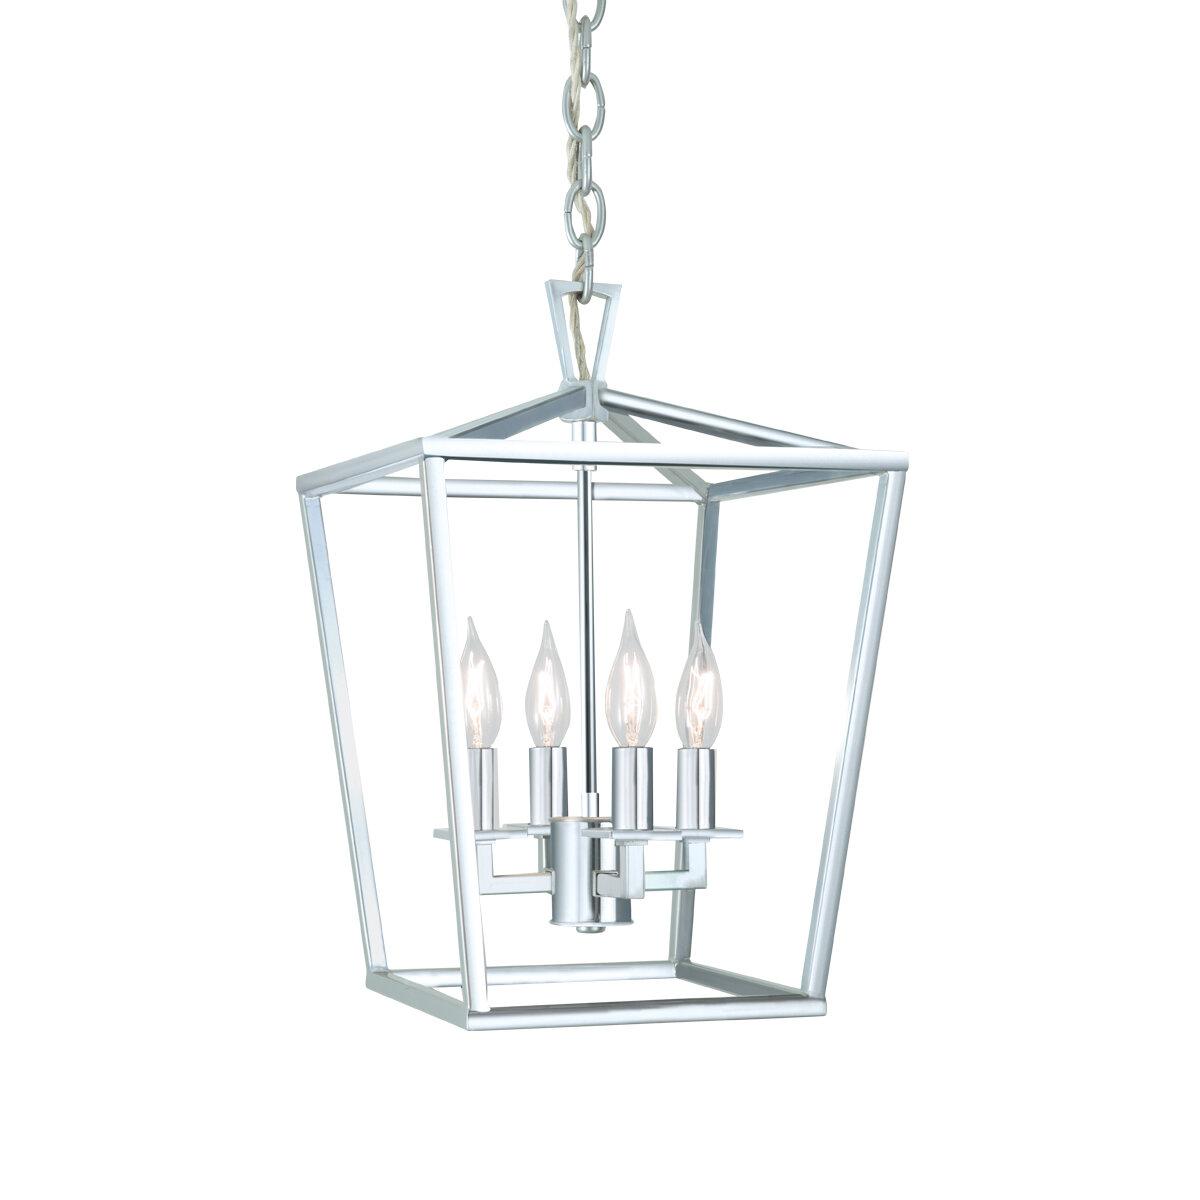 lighting cage. Lighting Cage C